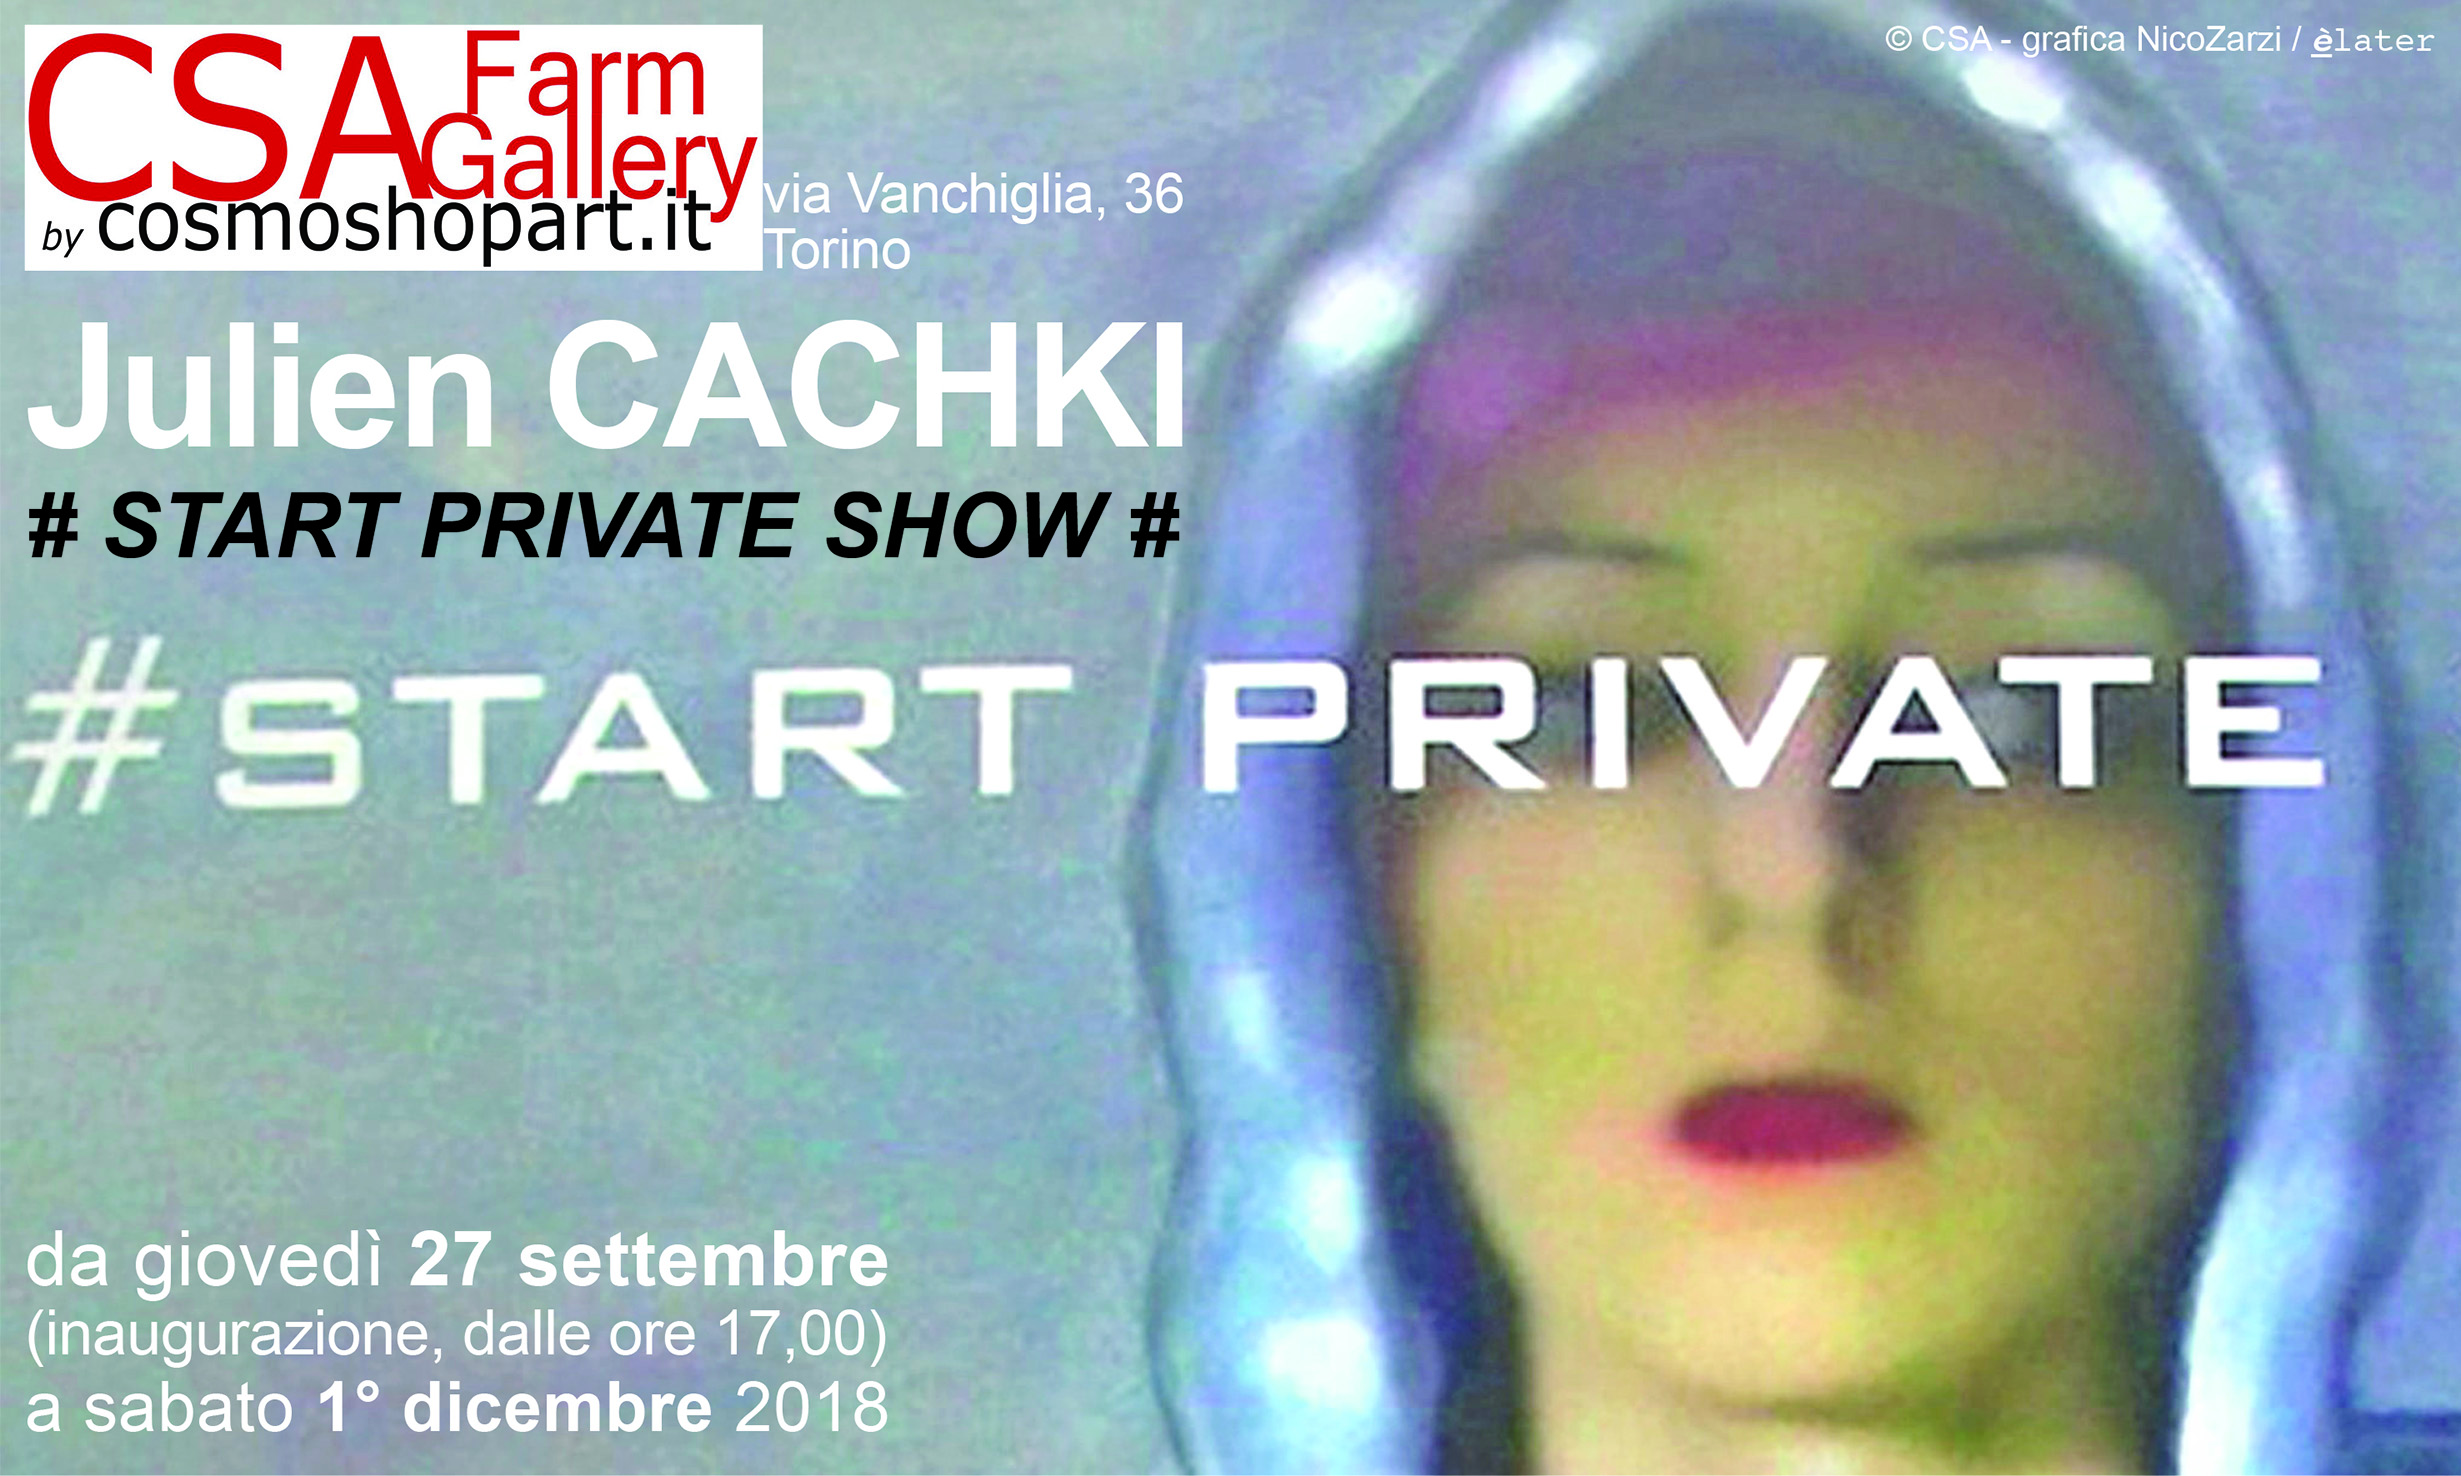 Julien Cachki - # Start Private Show # - 27/09-01/12/2018 © aut. / CSAFarm / Cosmoshopart - grafica NicoZarzi / èlater